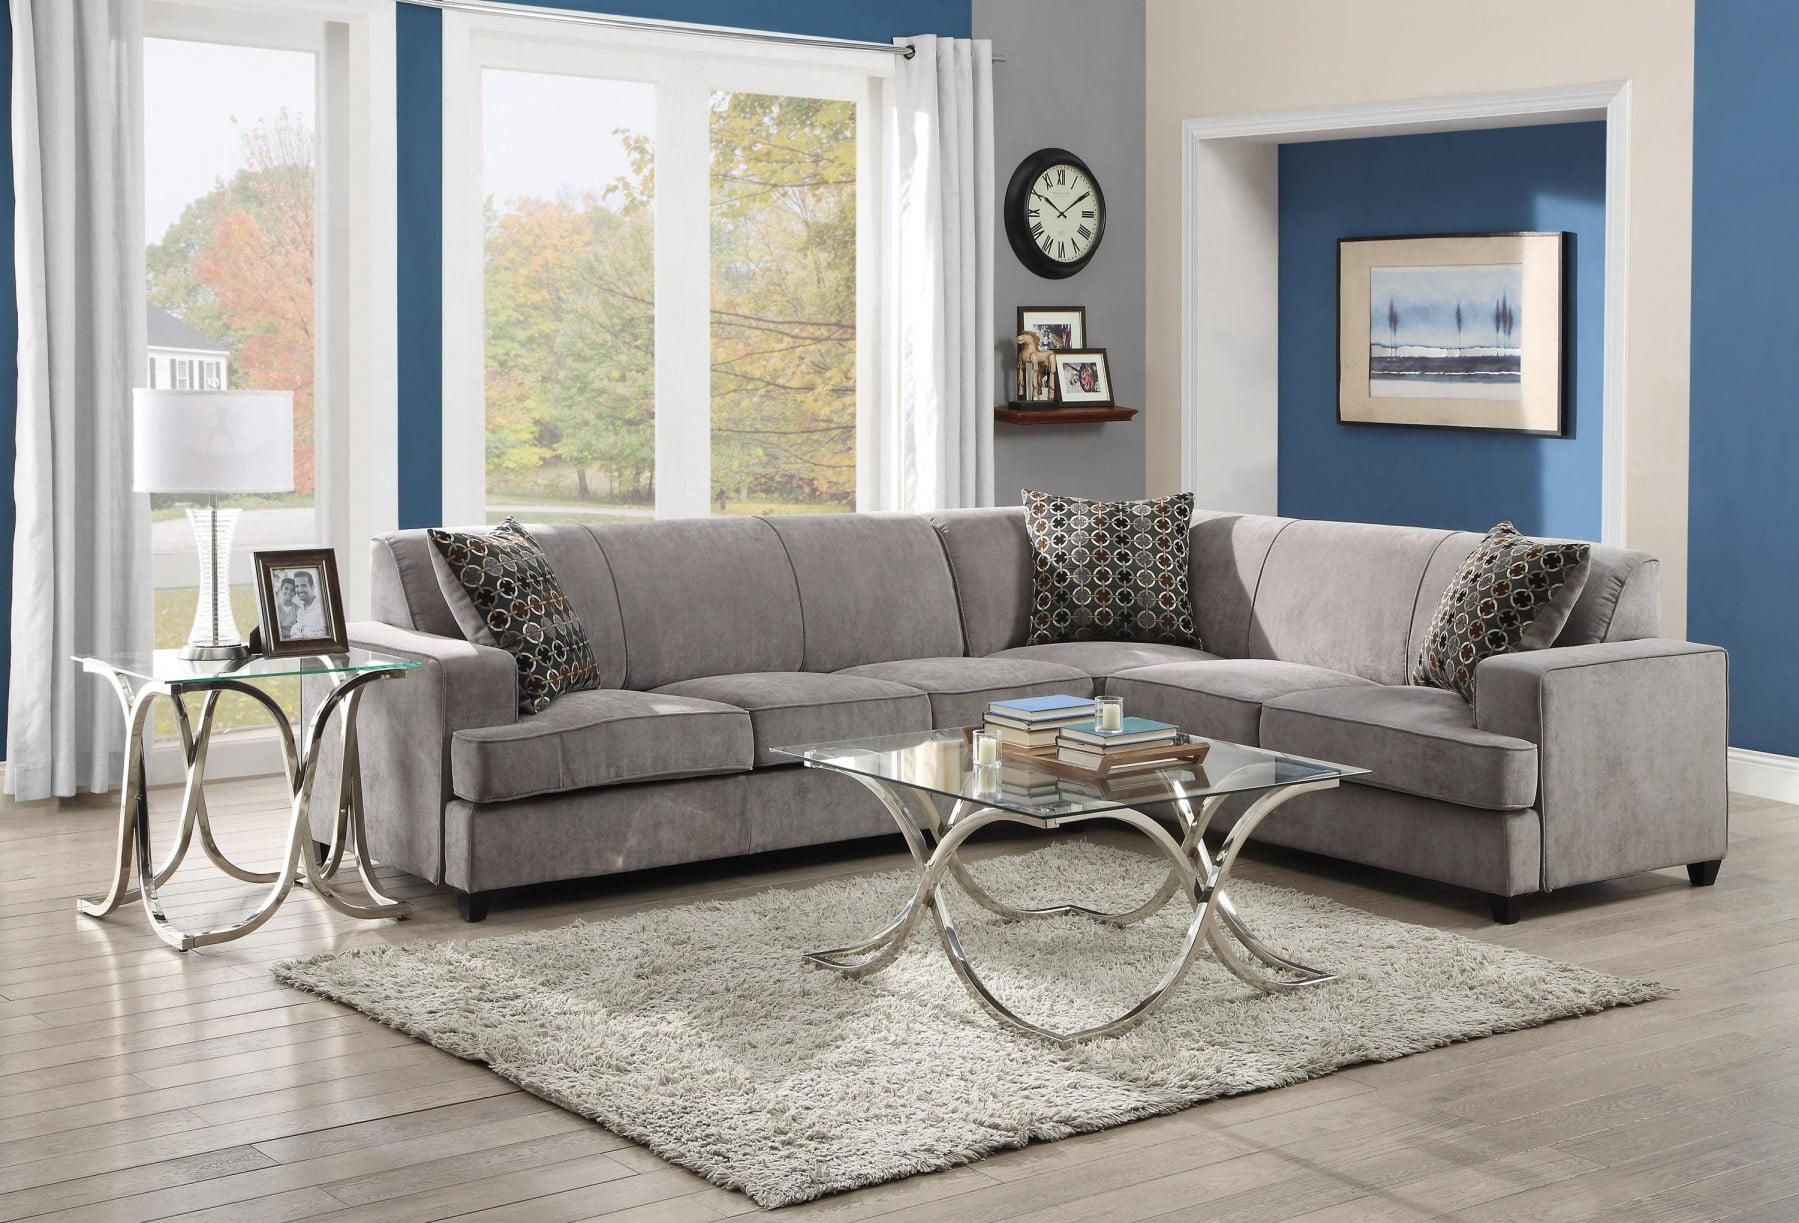 Strange Simple Relax Tess Grey Sectional Sofa With Sleeper Walmart Com Creativecarmelina Interior Chair Design Creativecarmelinacom